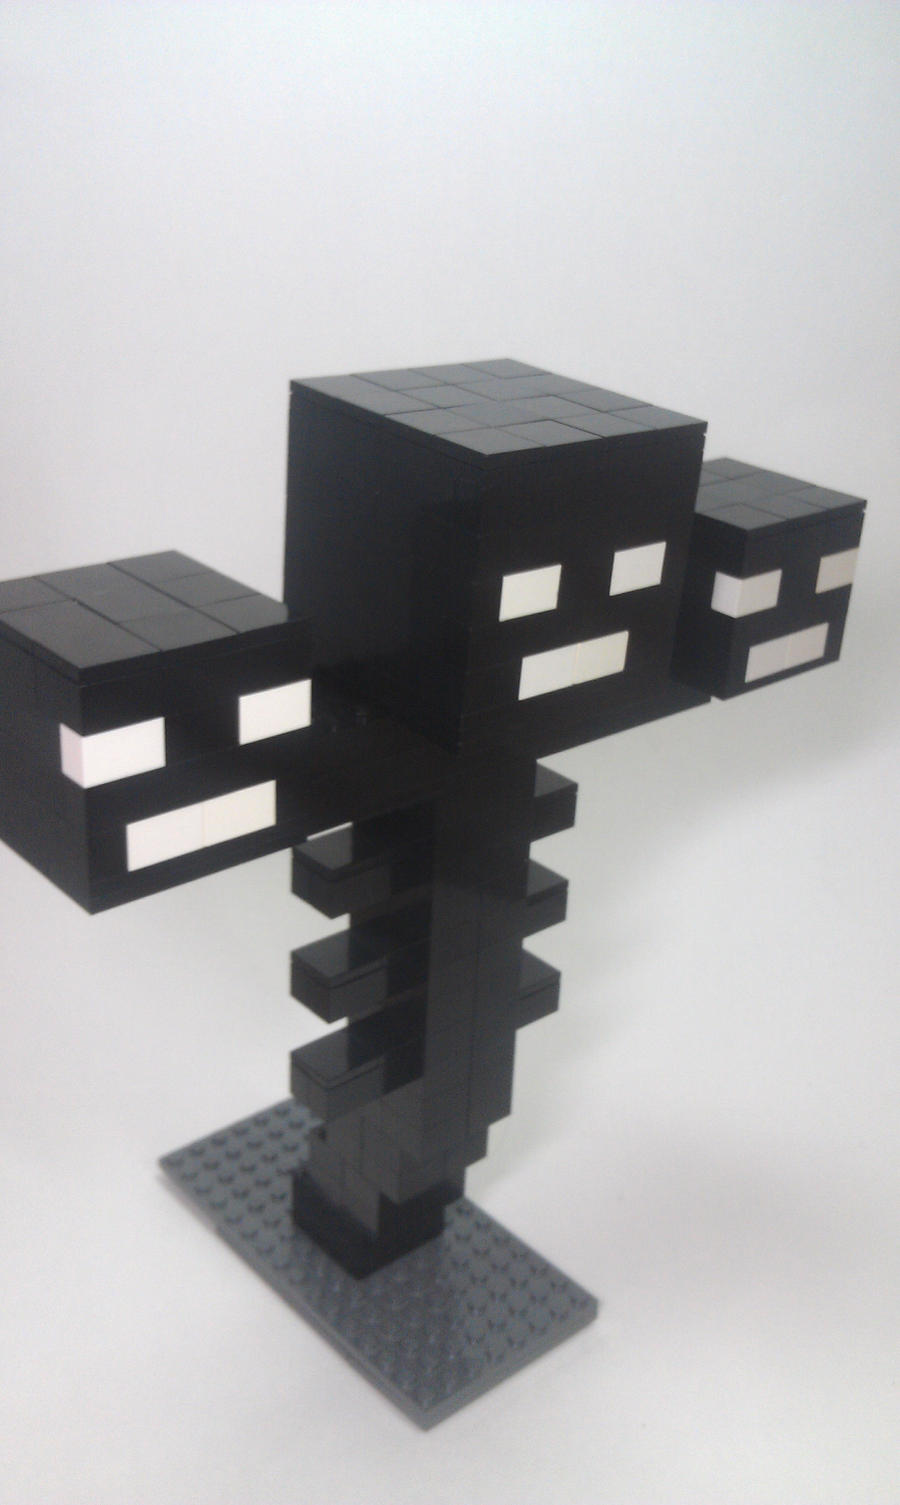 Minecraft Wither Lego By Chuchithathechuchu On Deviantart